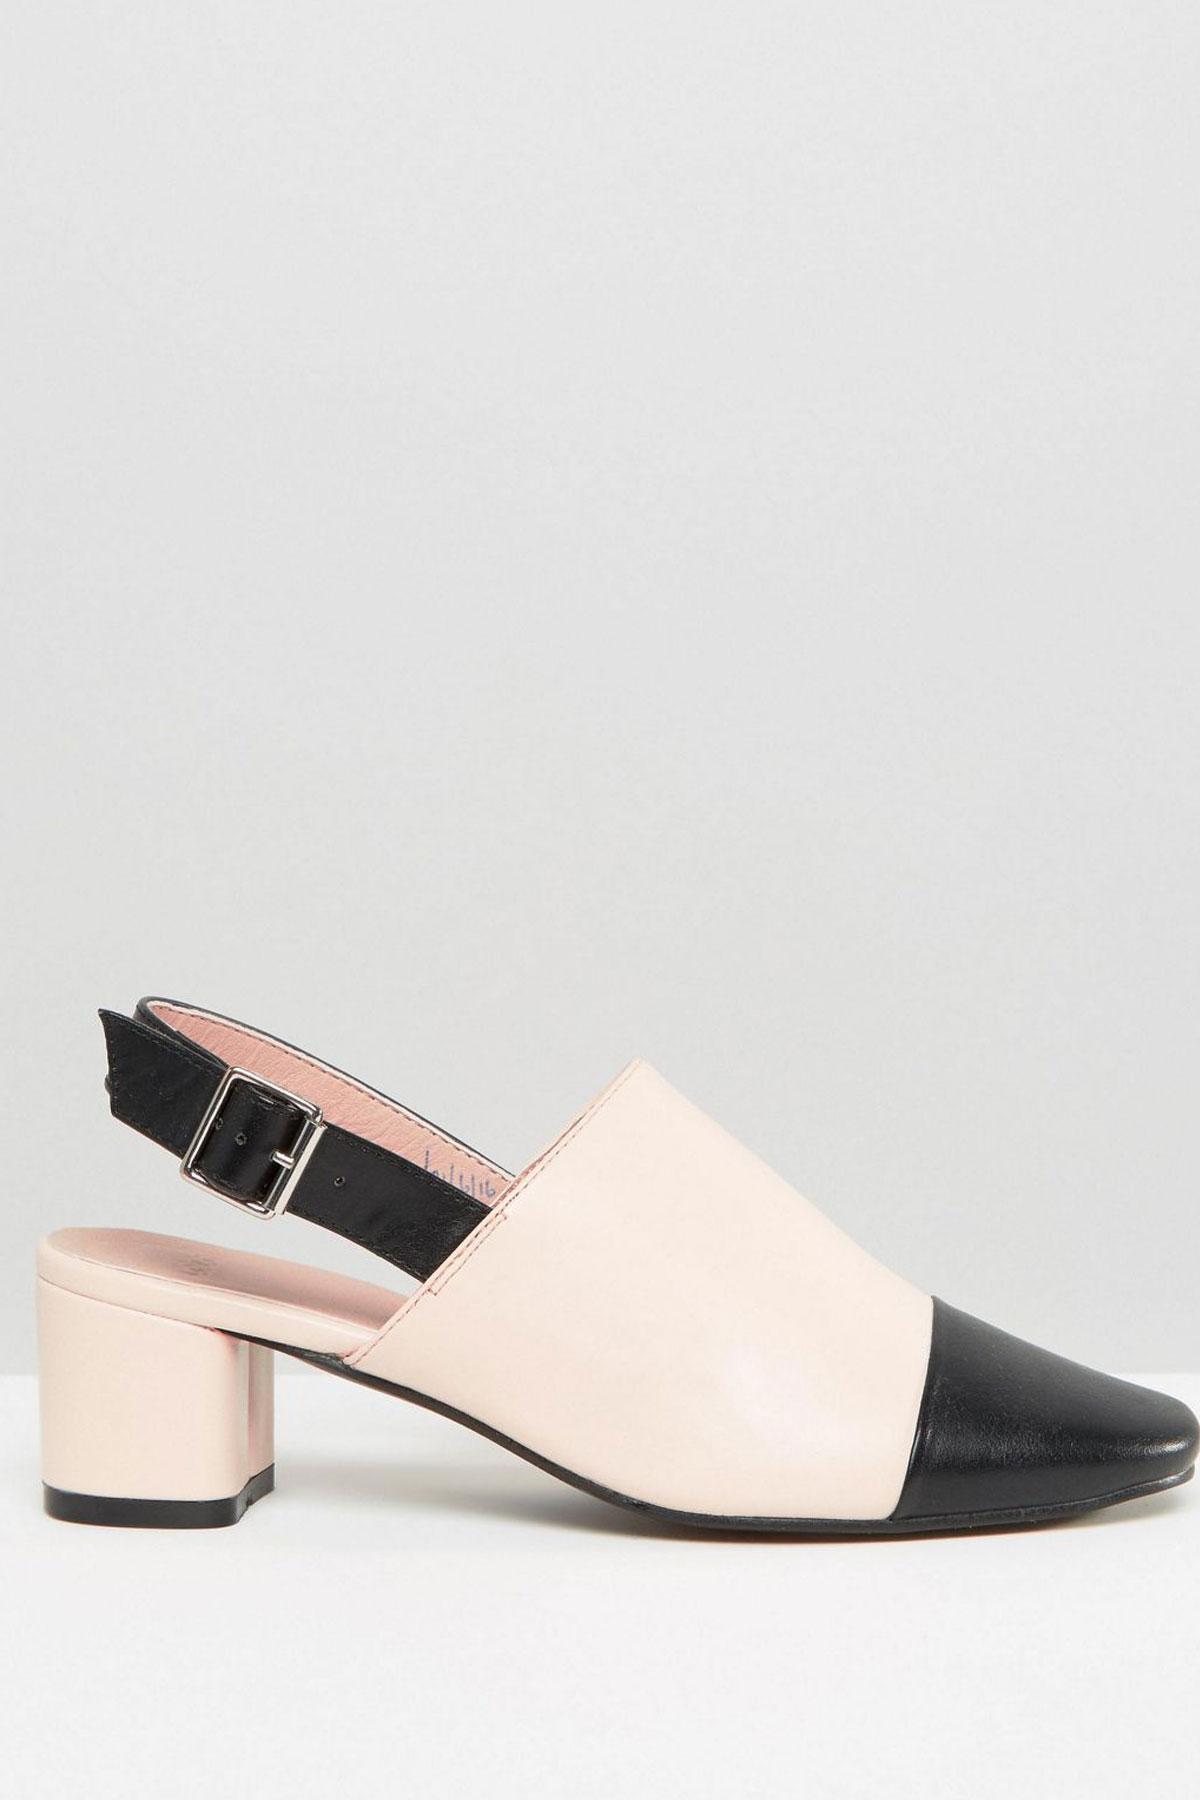 Pantofi Asos Oberon Sling Back